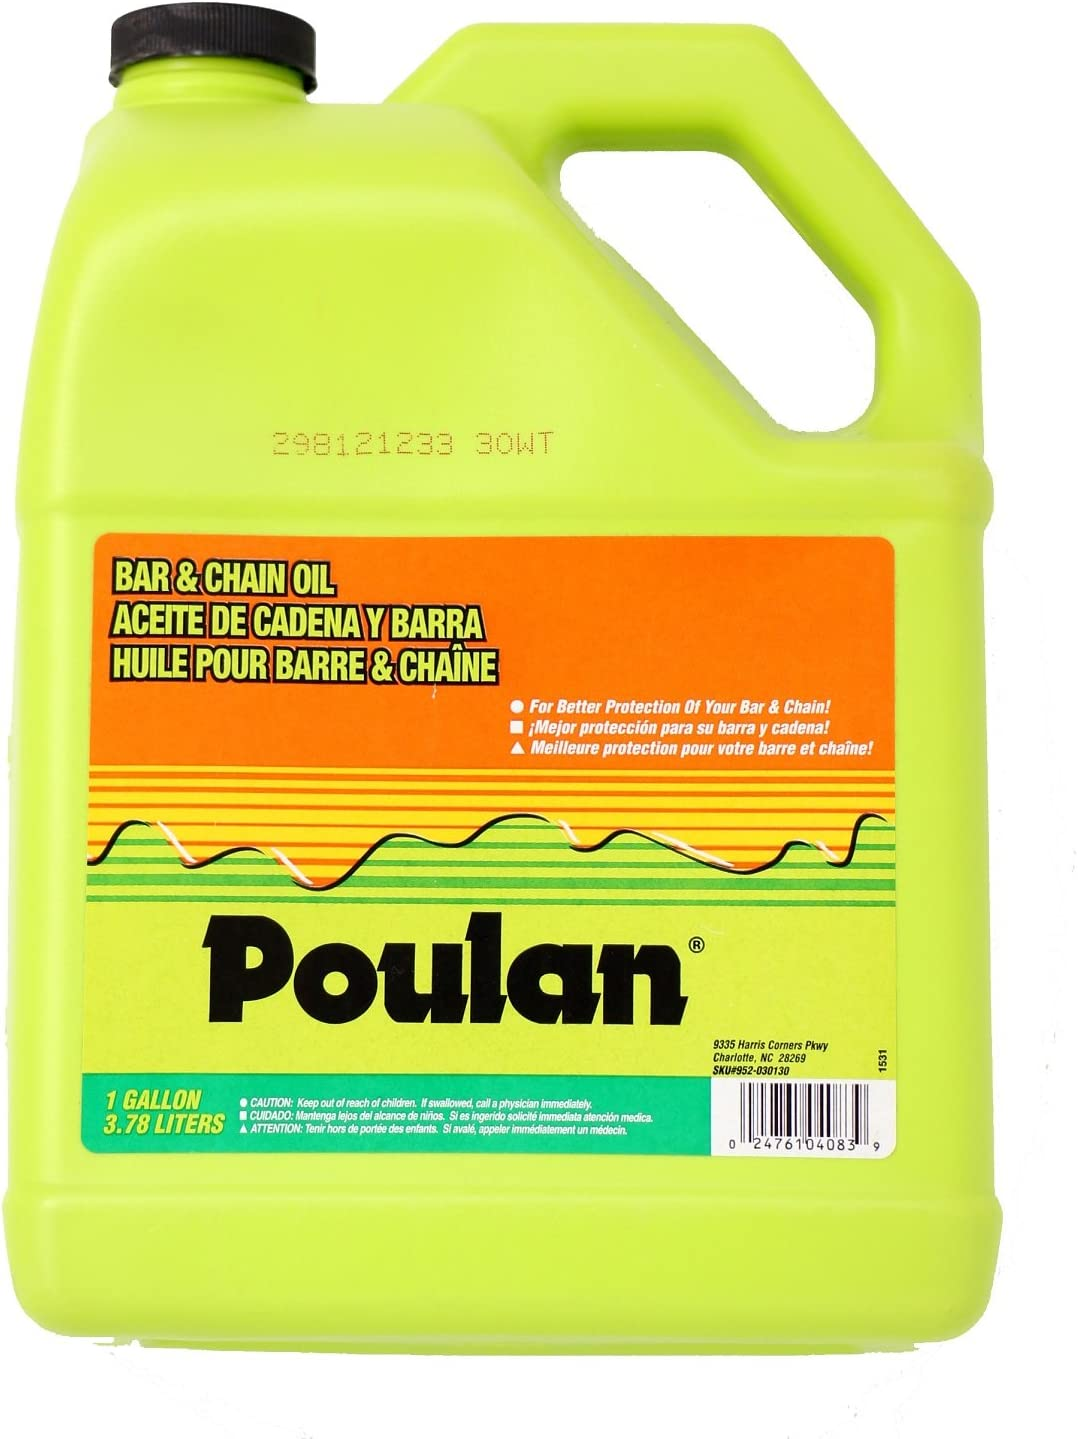 Amazon.com: Poulan 952030130 Bar y aceite para cadena, 1 ...